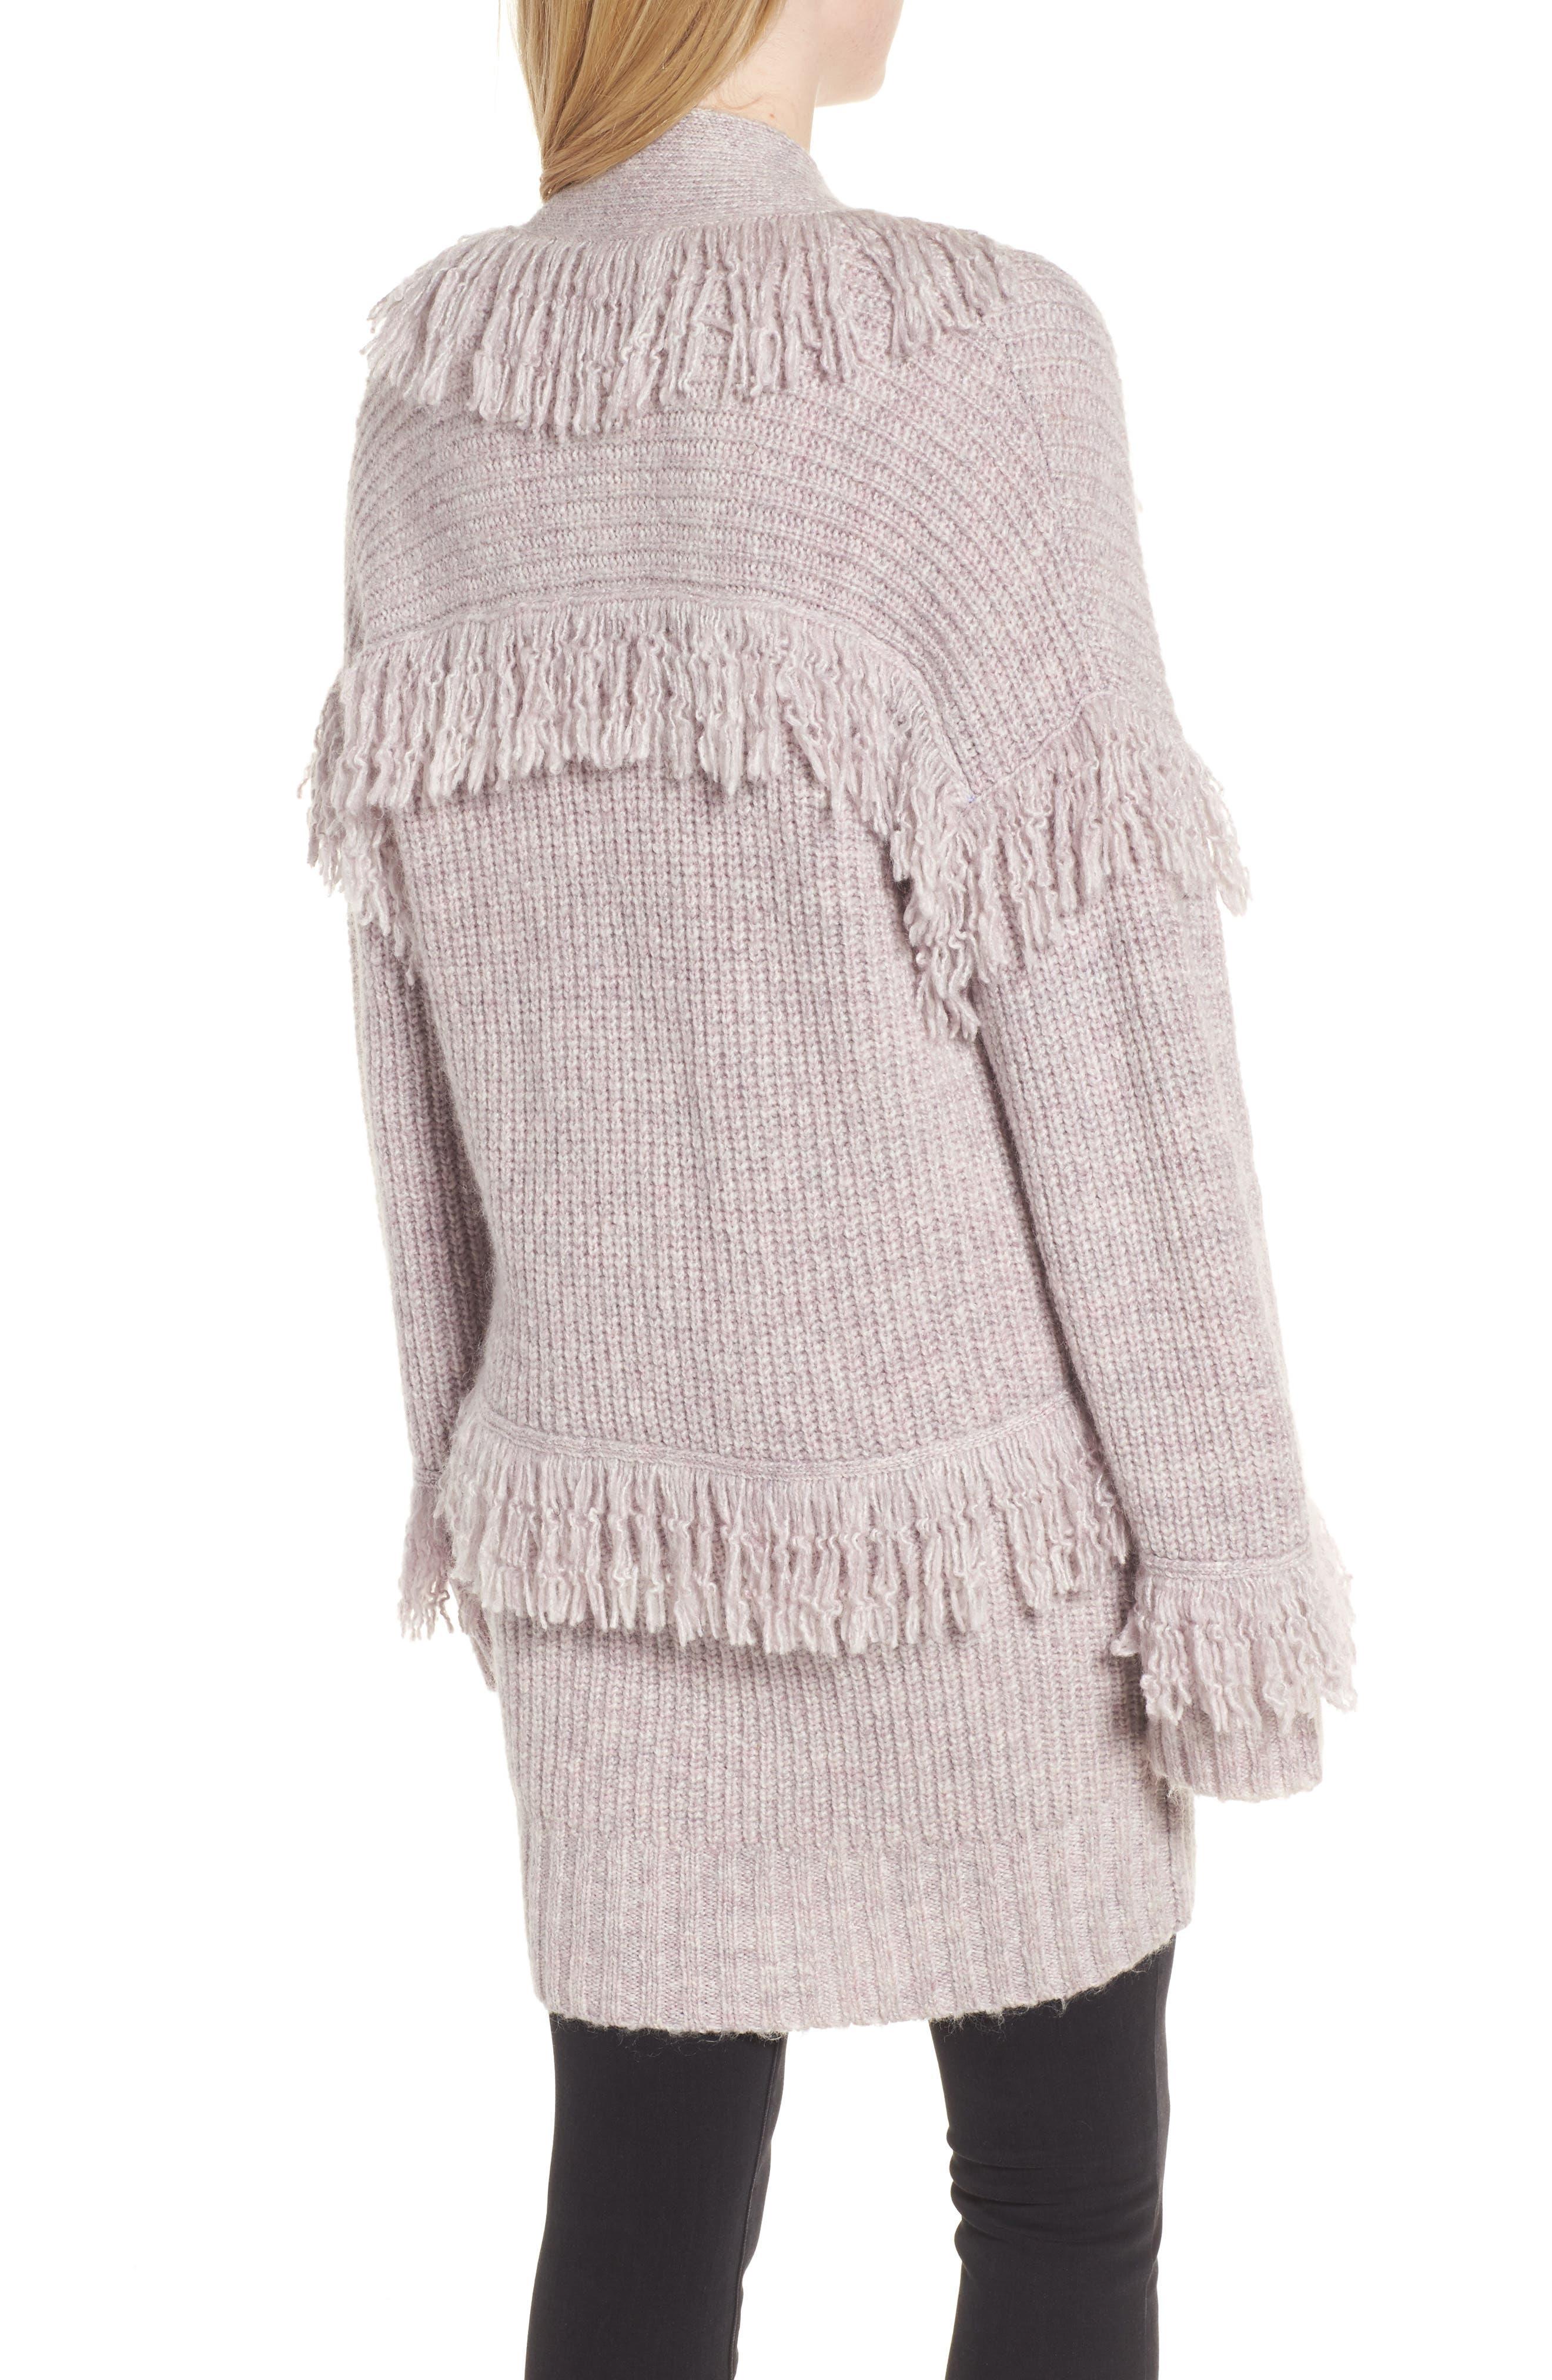 Berea Fringe Cardigan Sweater,                             Alternate thumbnail 2, color,                             684